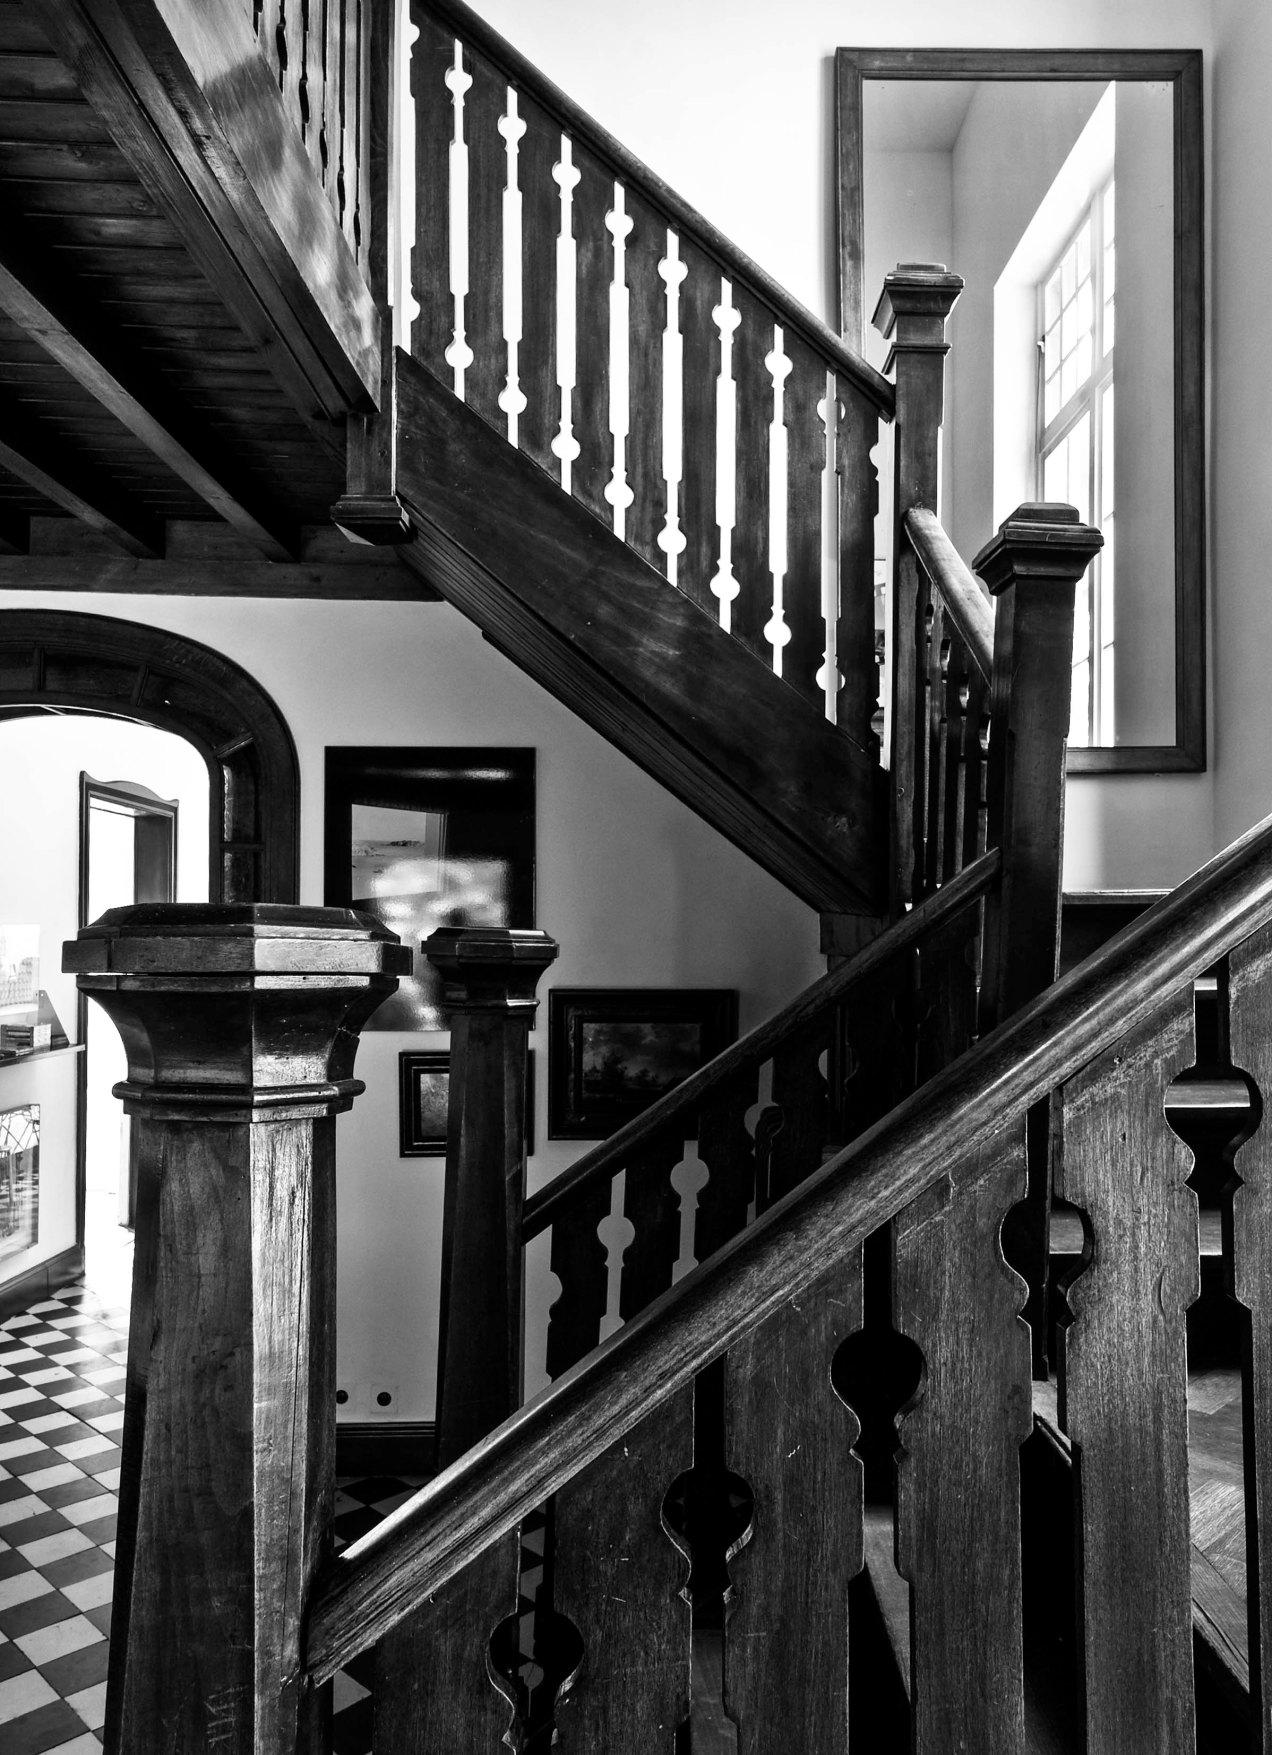 Escalier, belgique, gildalliere, 2012